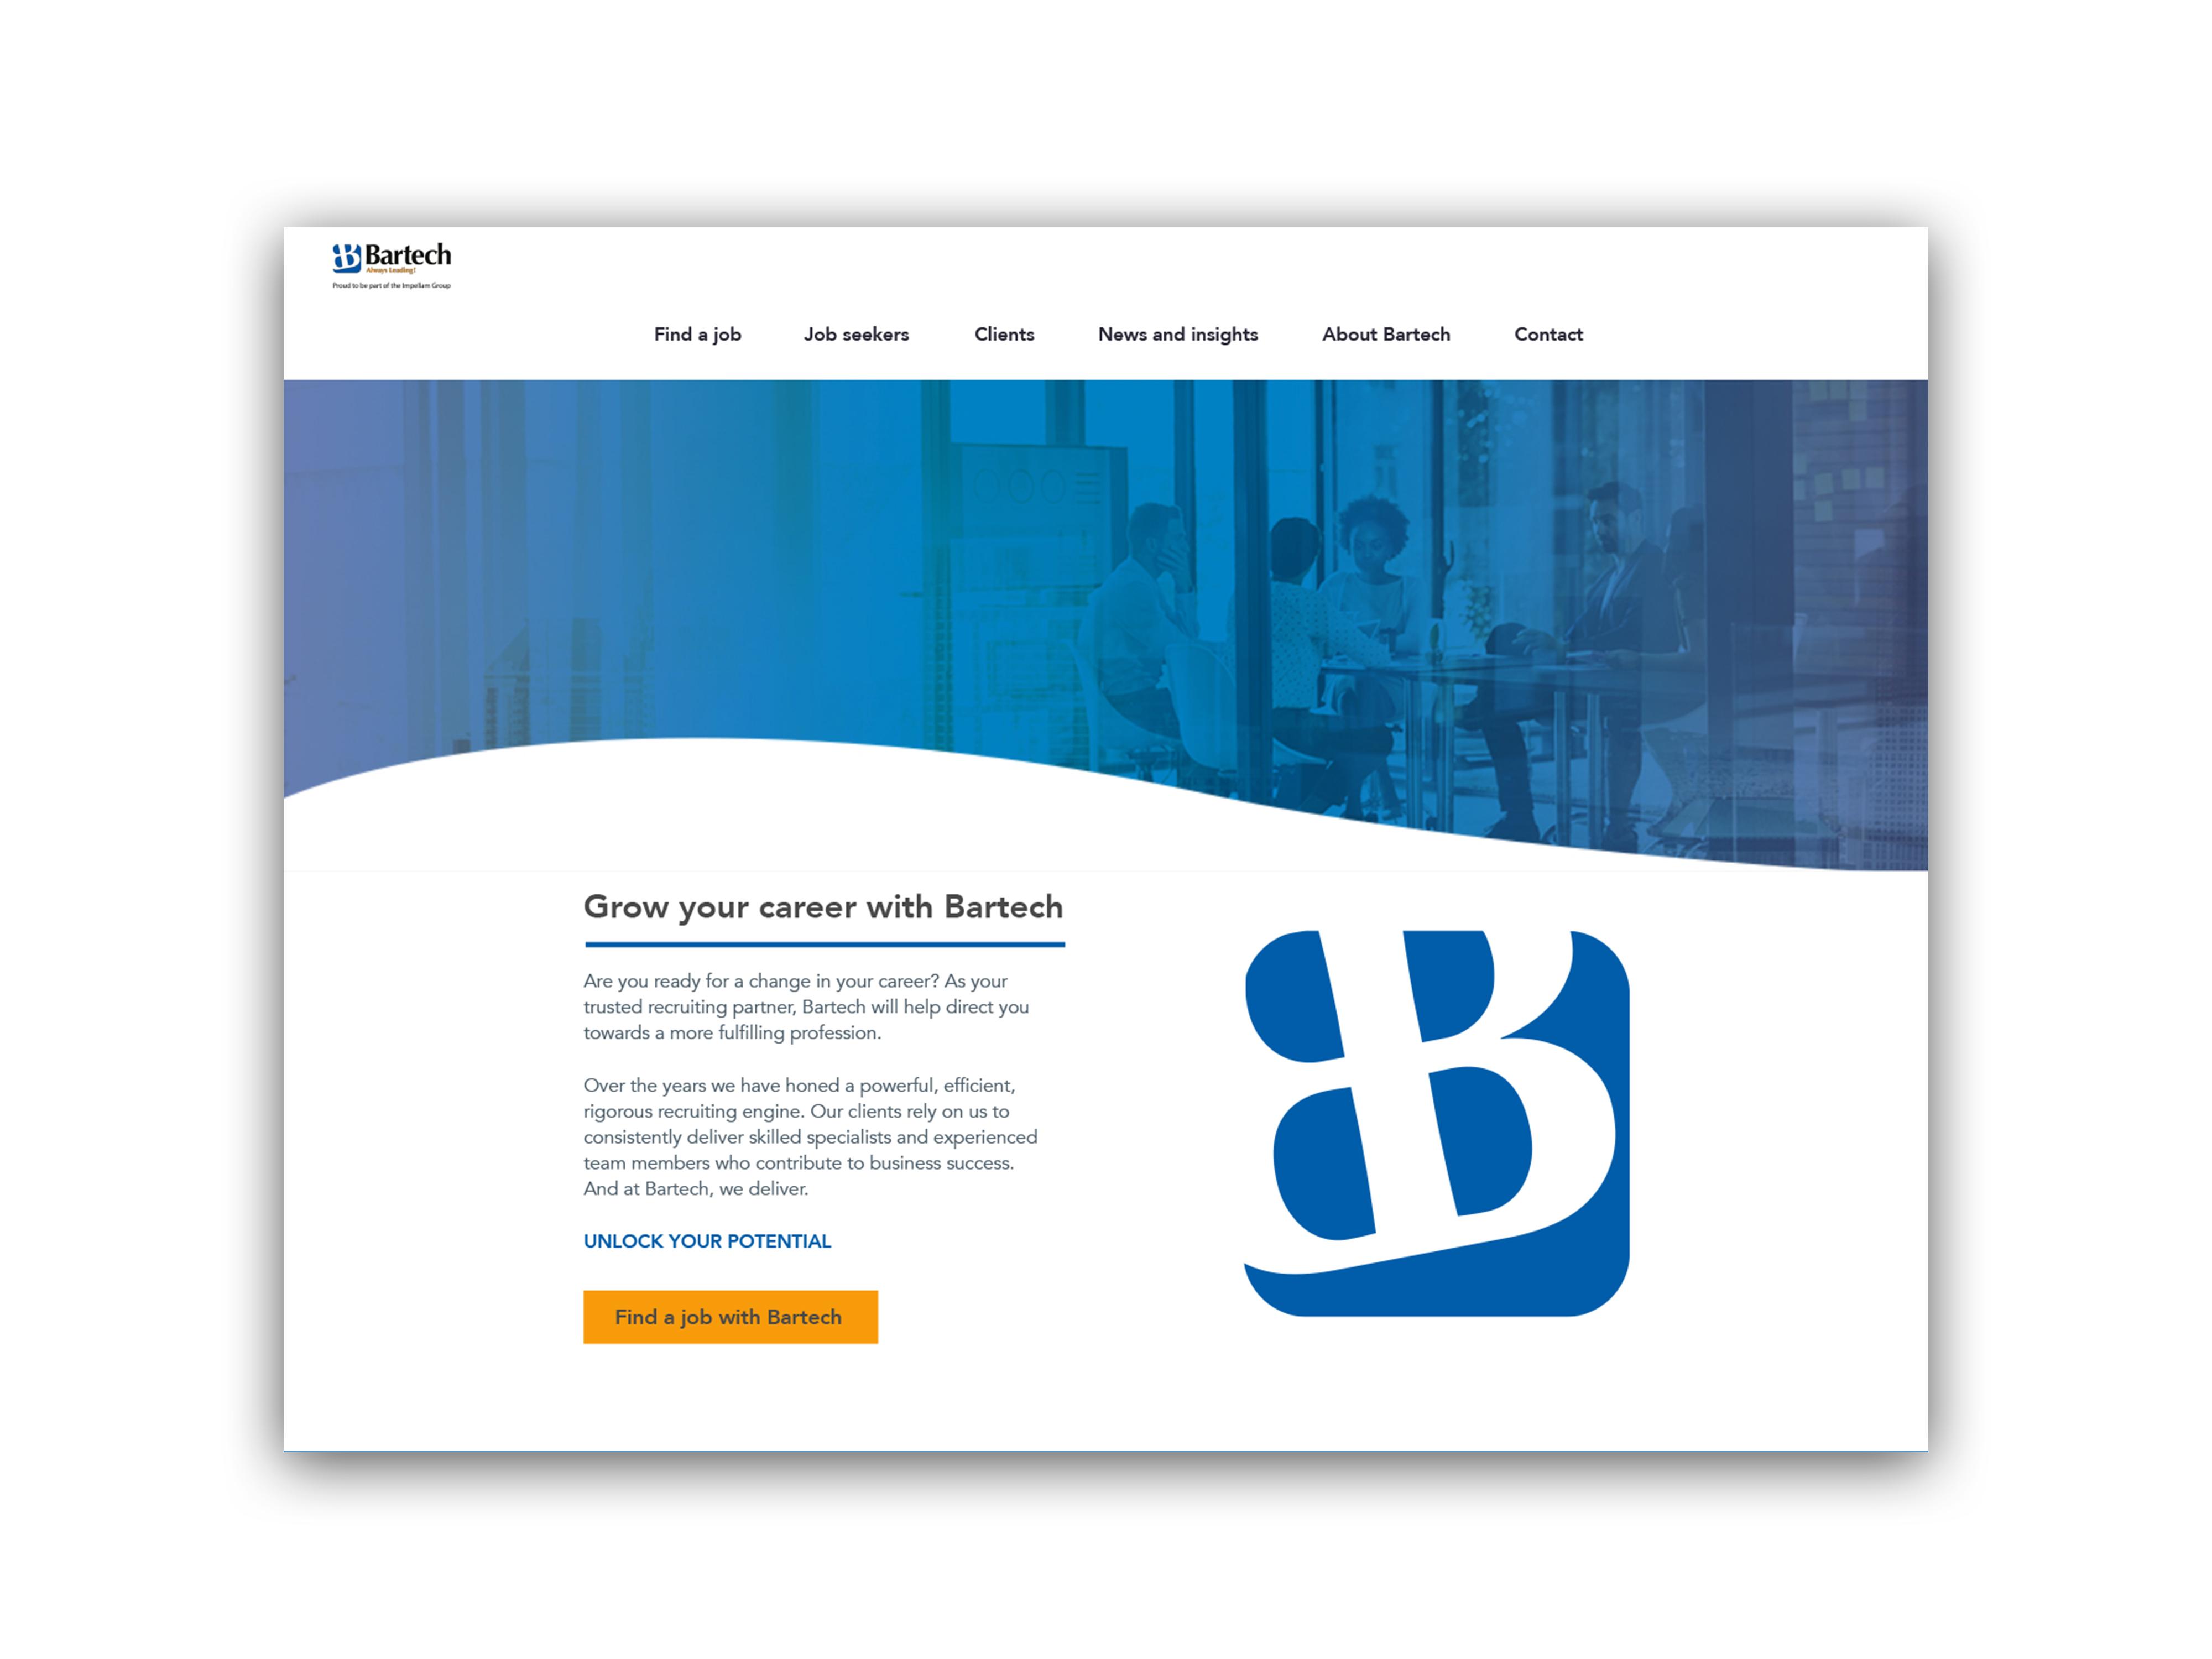 Bartech website desktop mockup